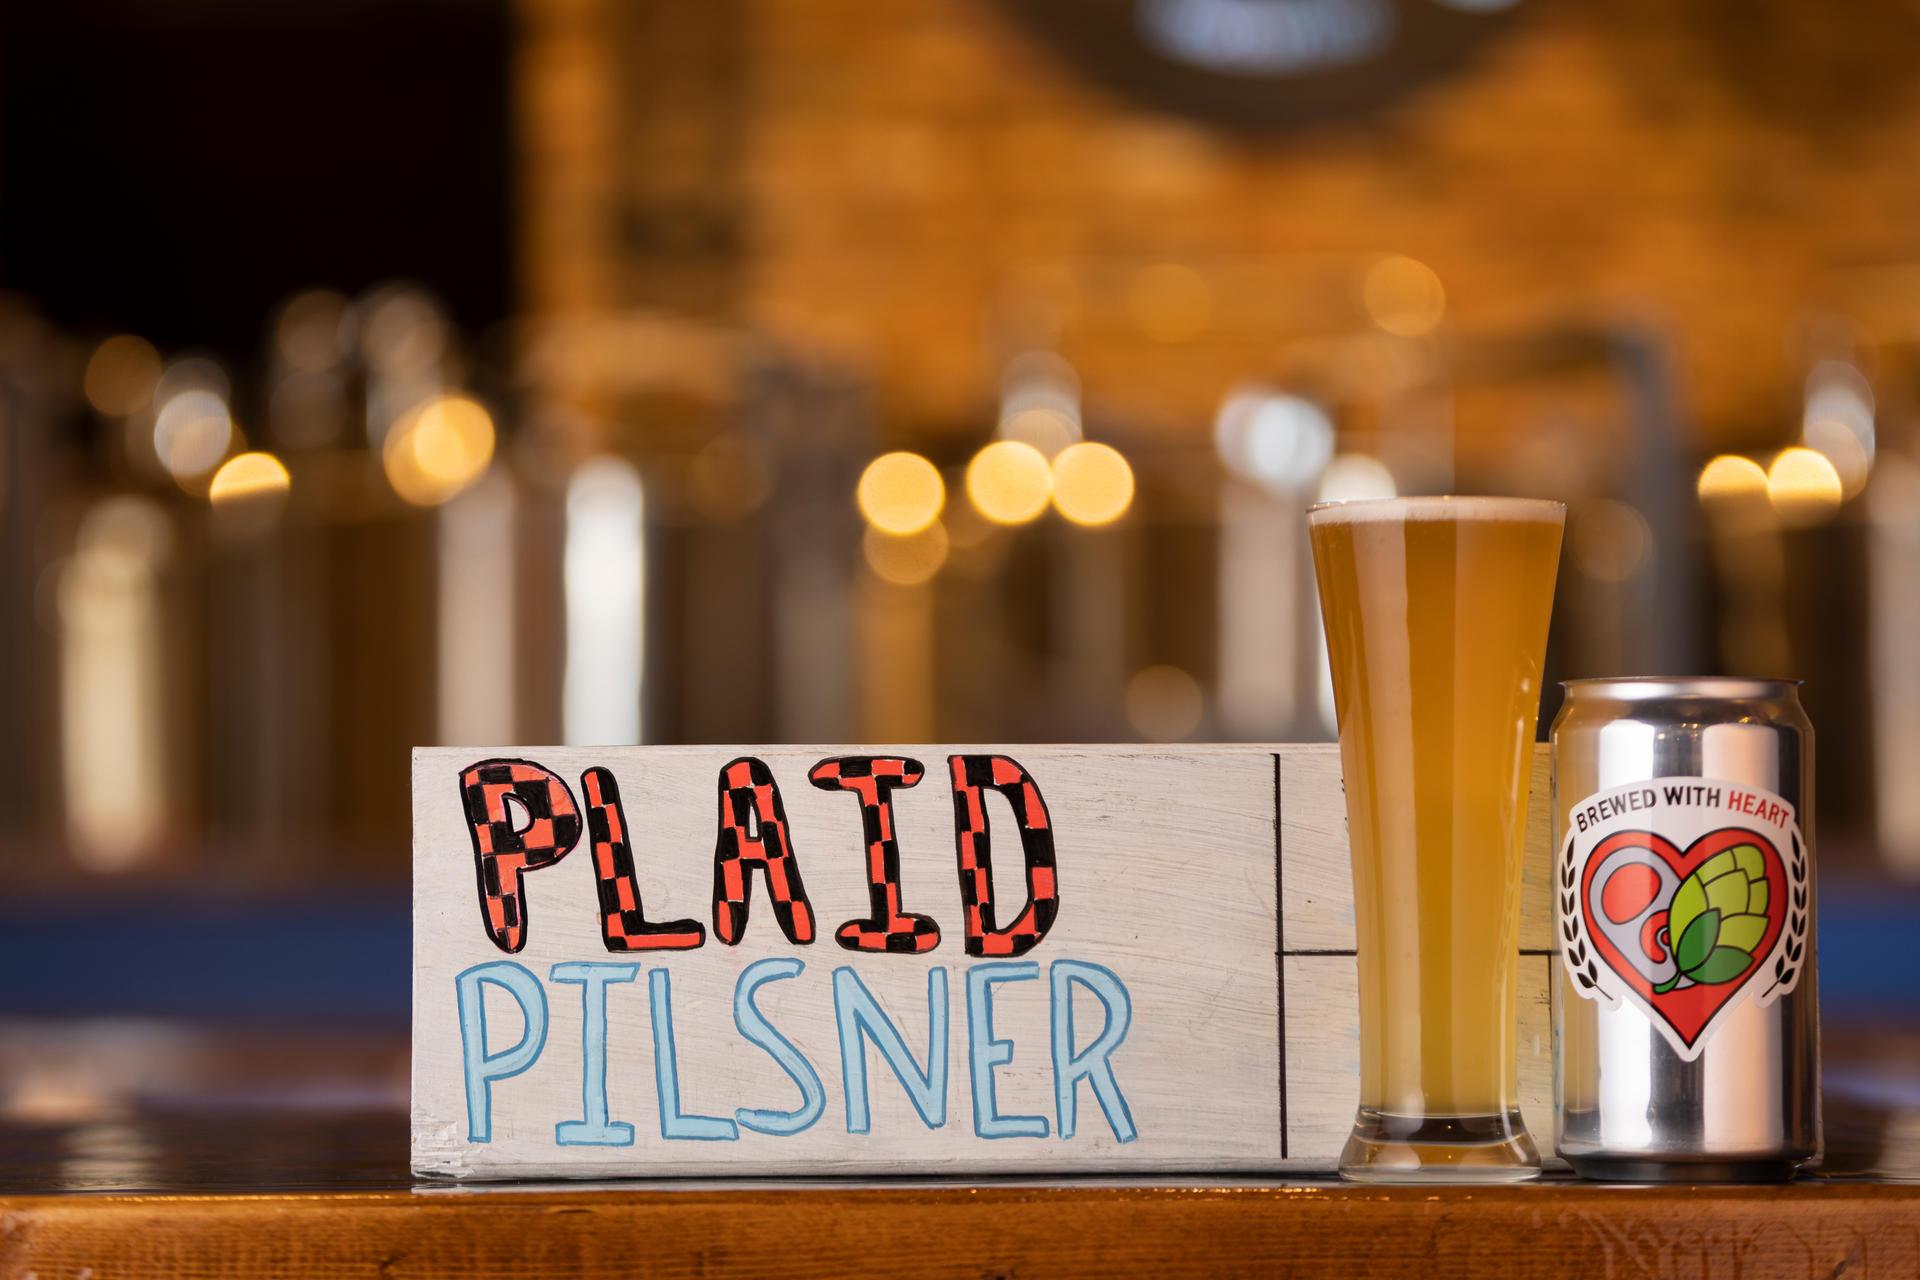 Plaid Pilsner